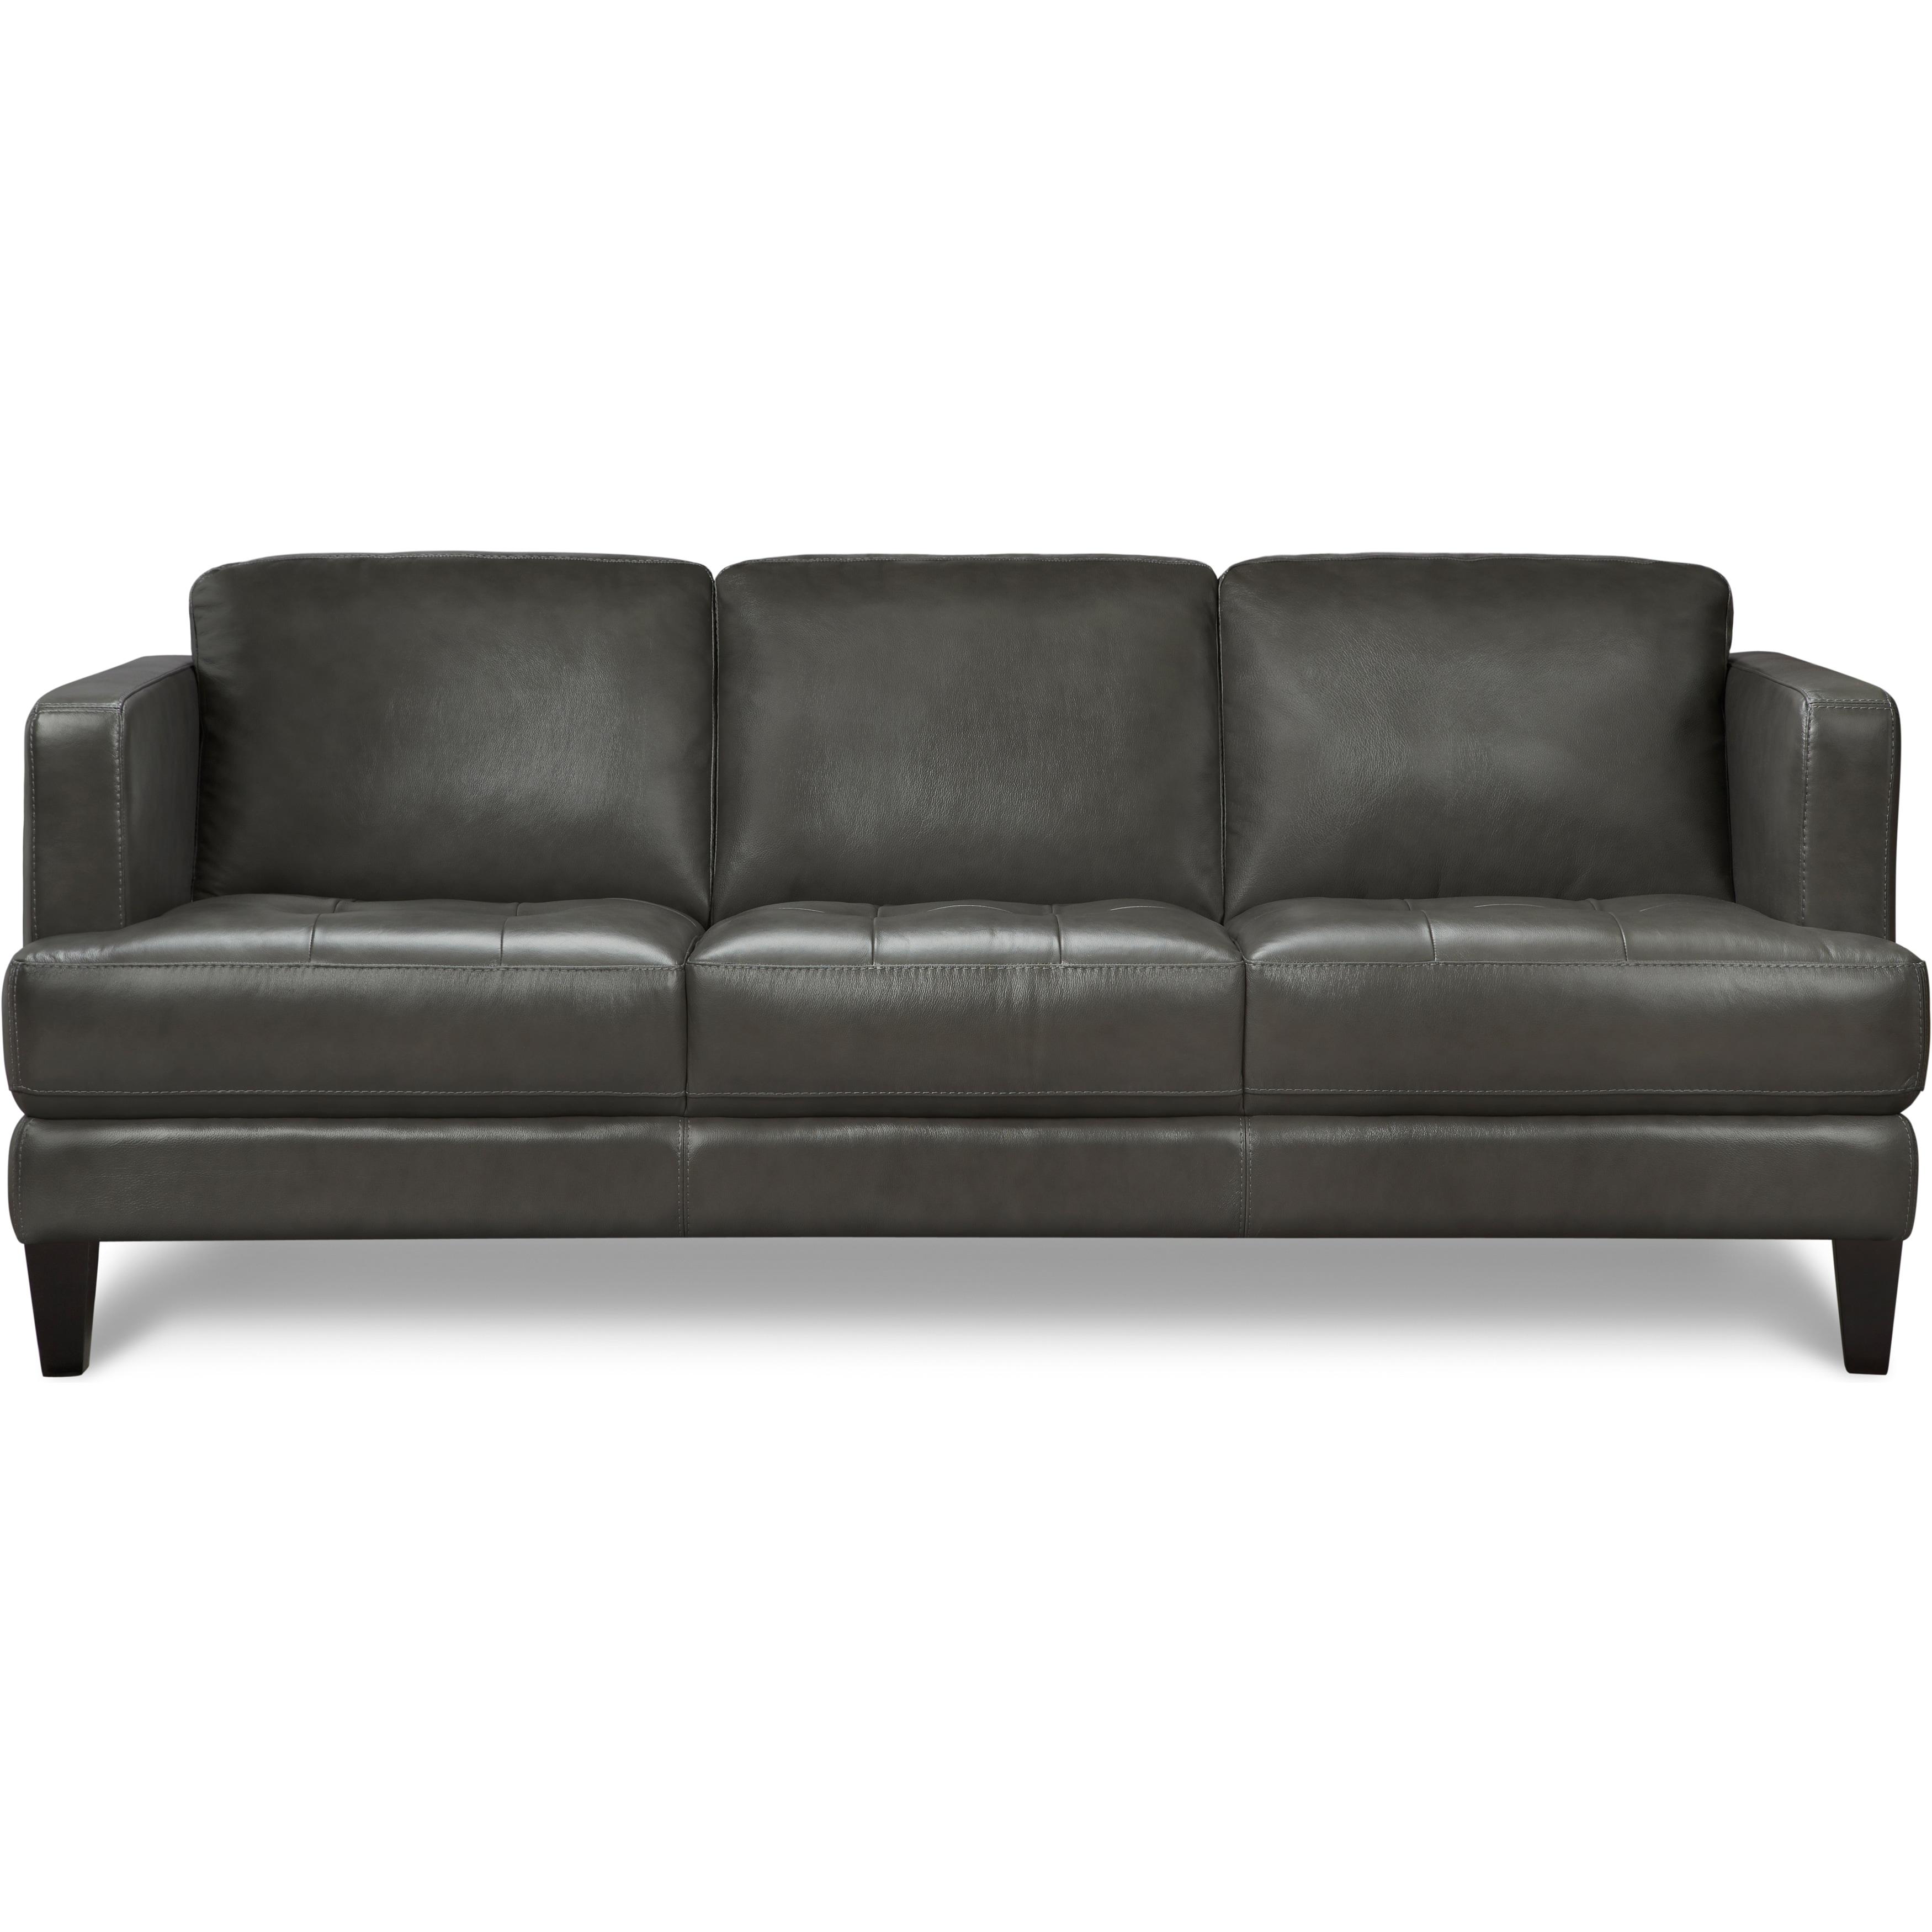 art van jeremy sofa 17101588 overstock shopping